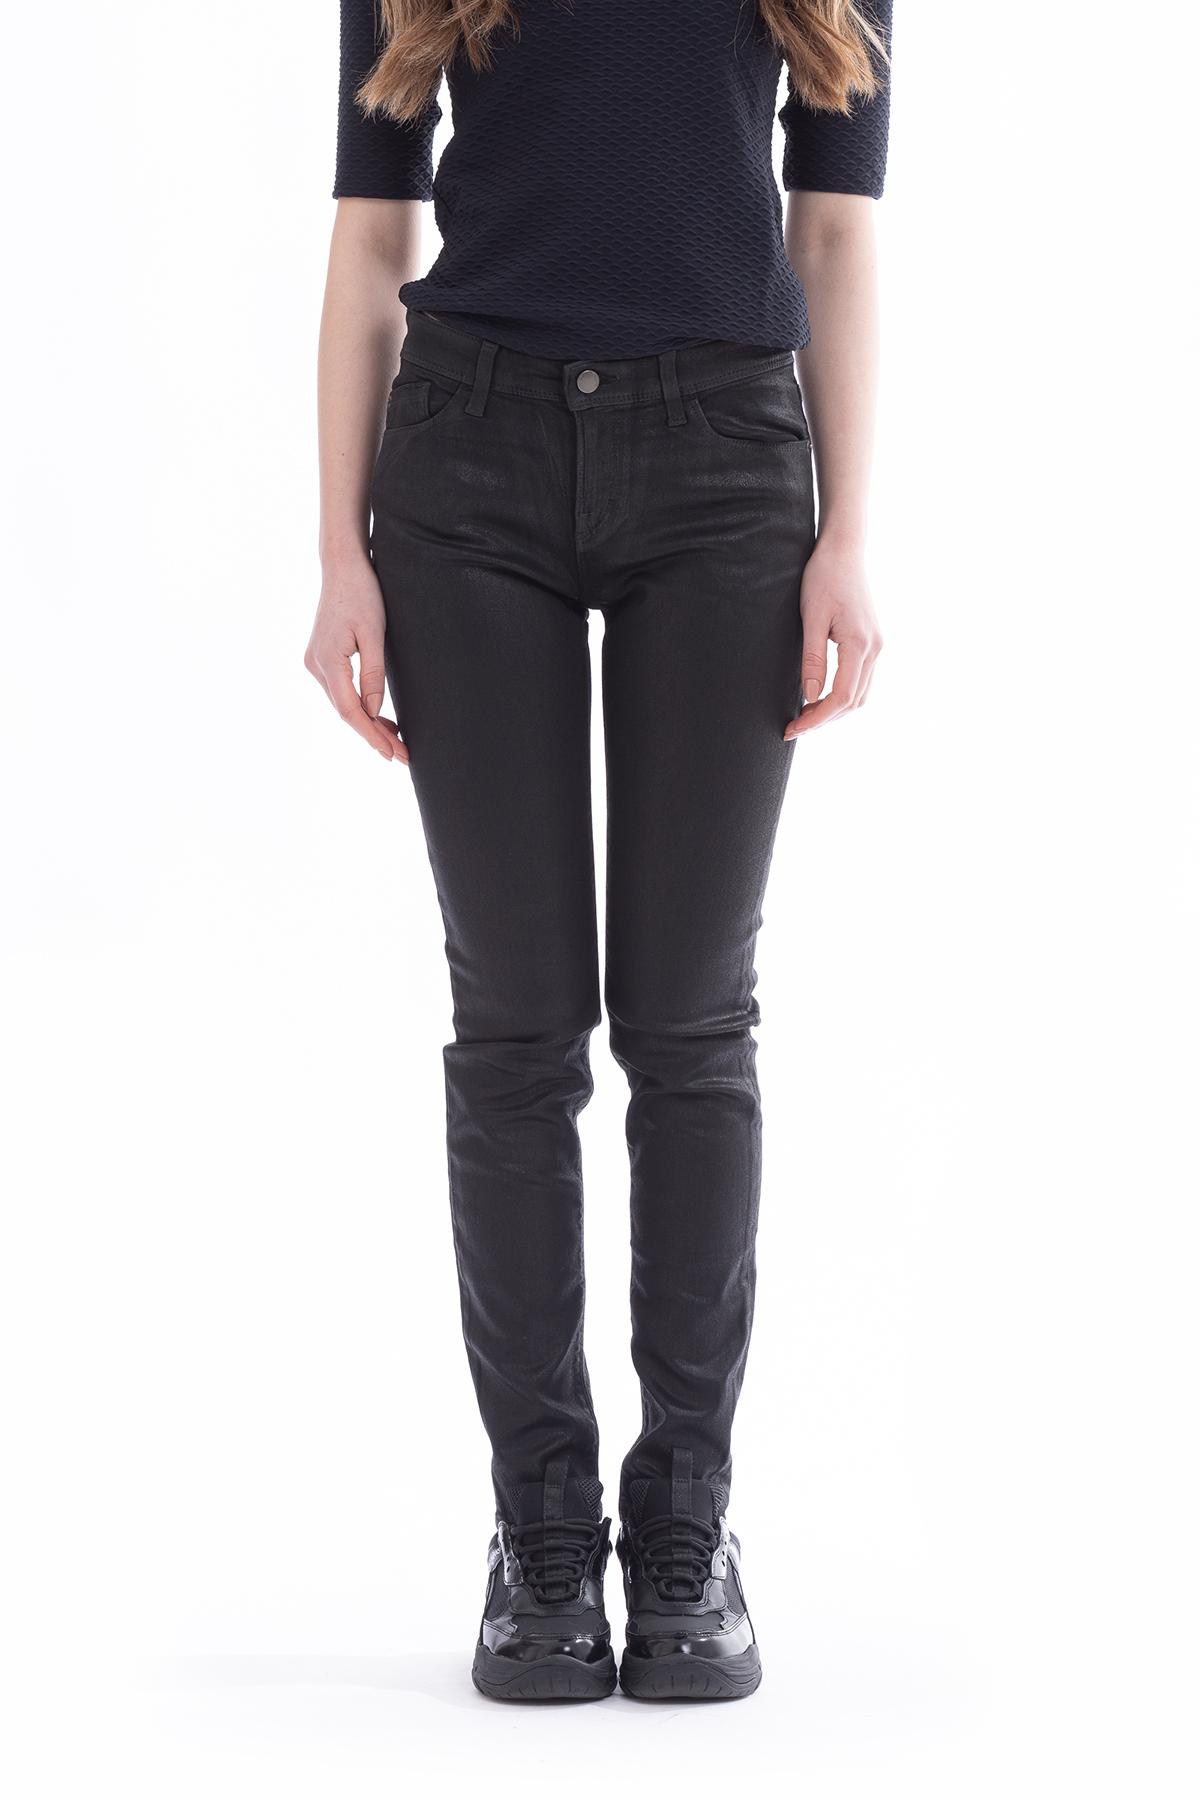 Emporio Armani Skinny Kadın Jean Pantolon